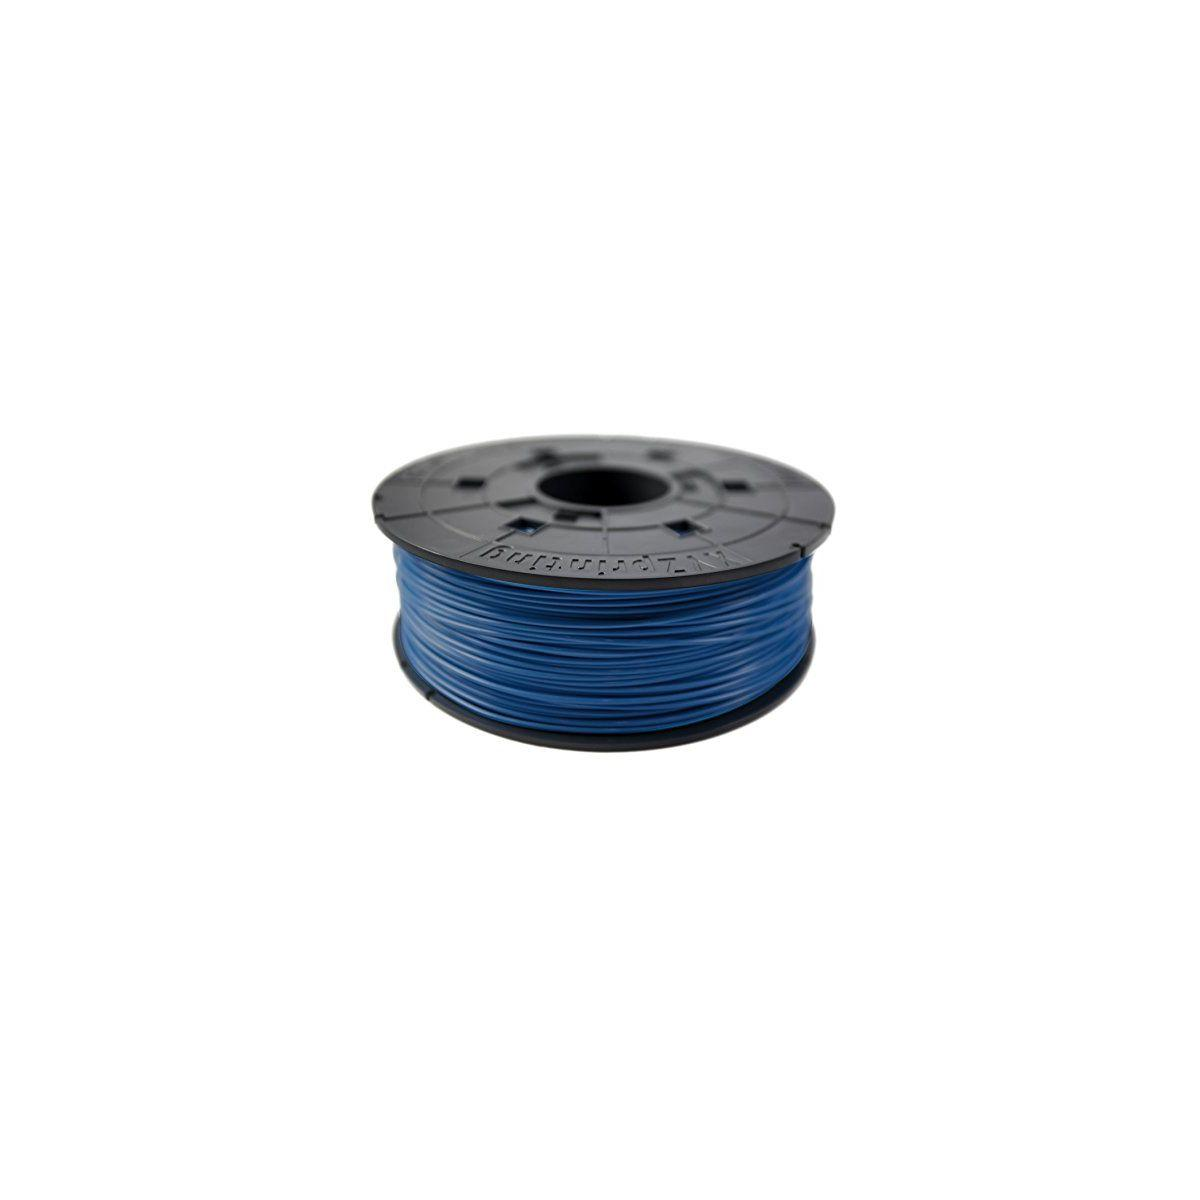 Filament 3d xyz printing bobine recharge abs bleu electrique -...